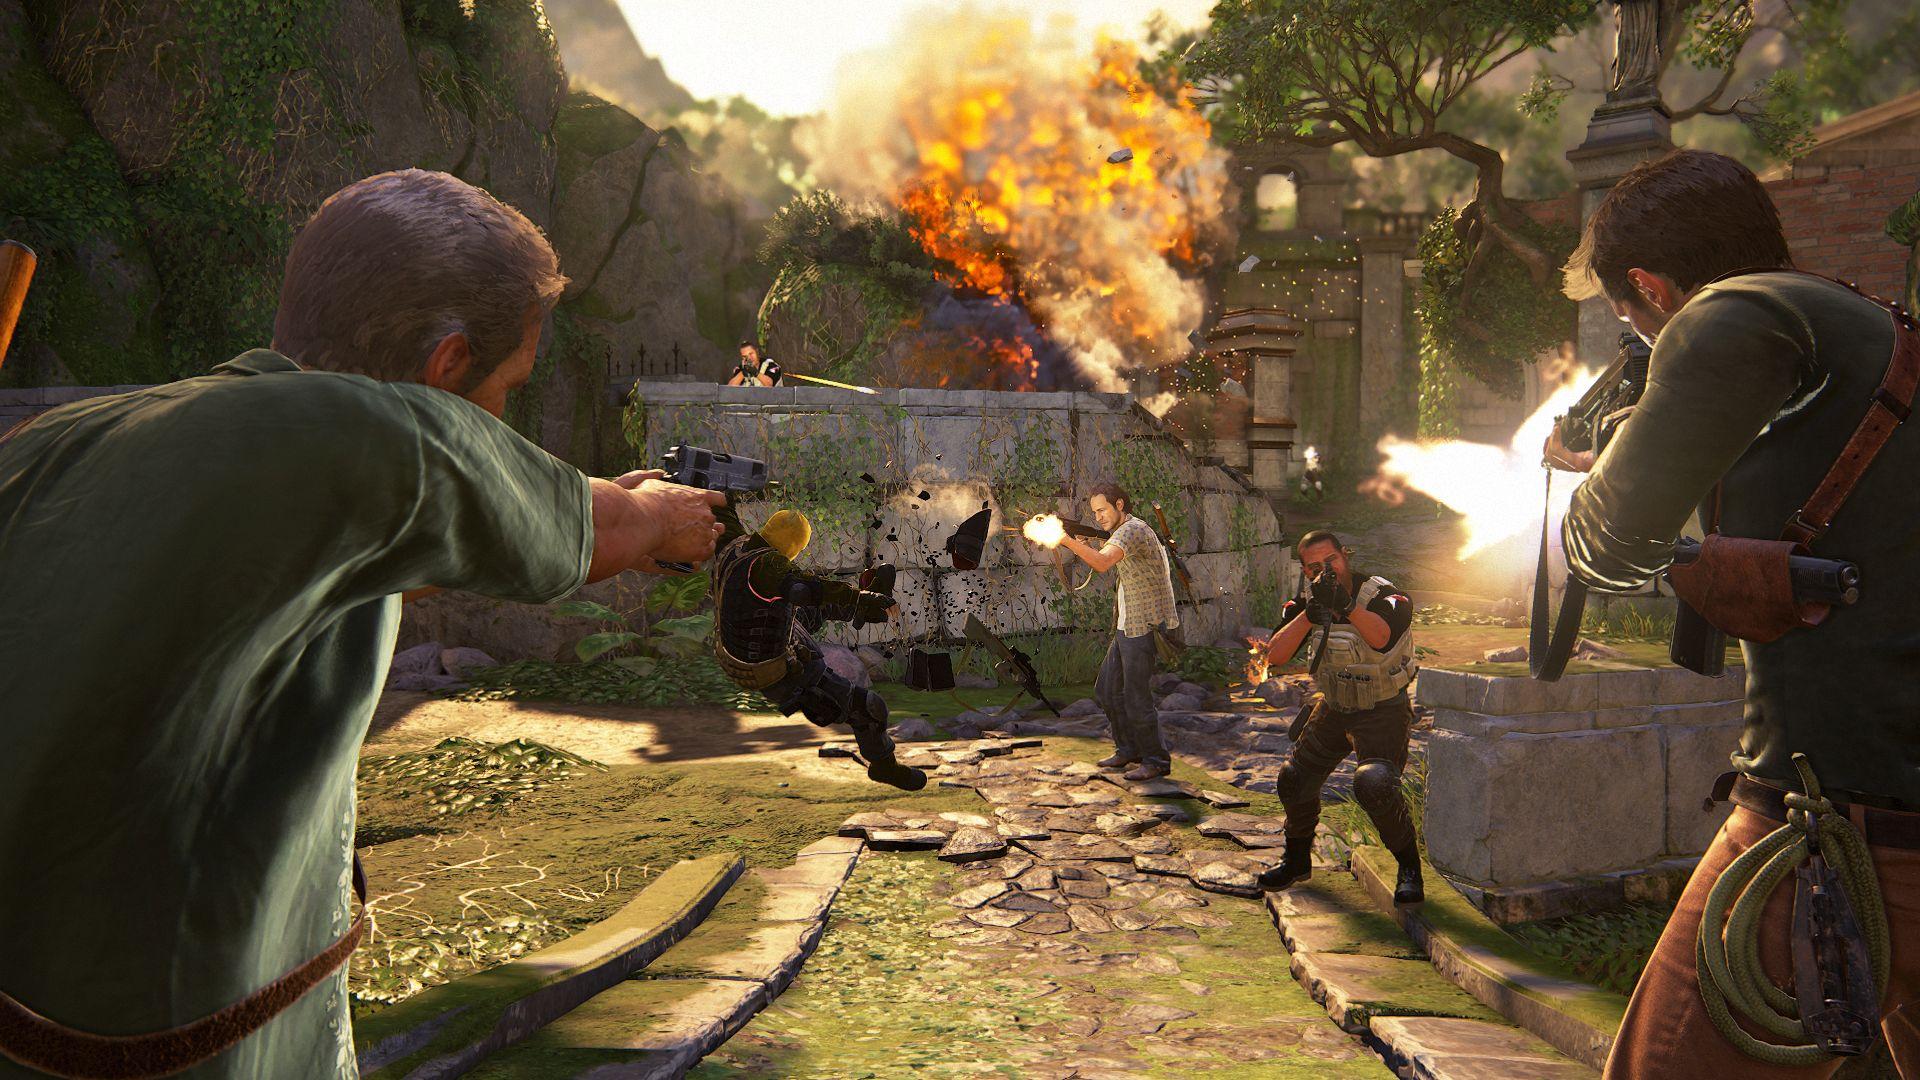 Uncharted 4: annunciata la Survival mode con un trailer